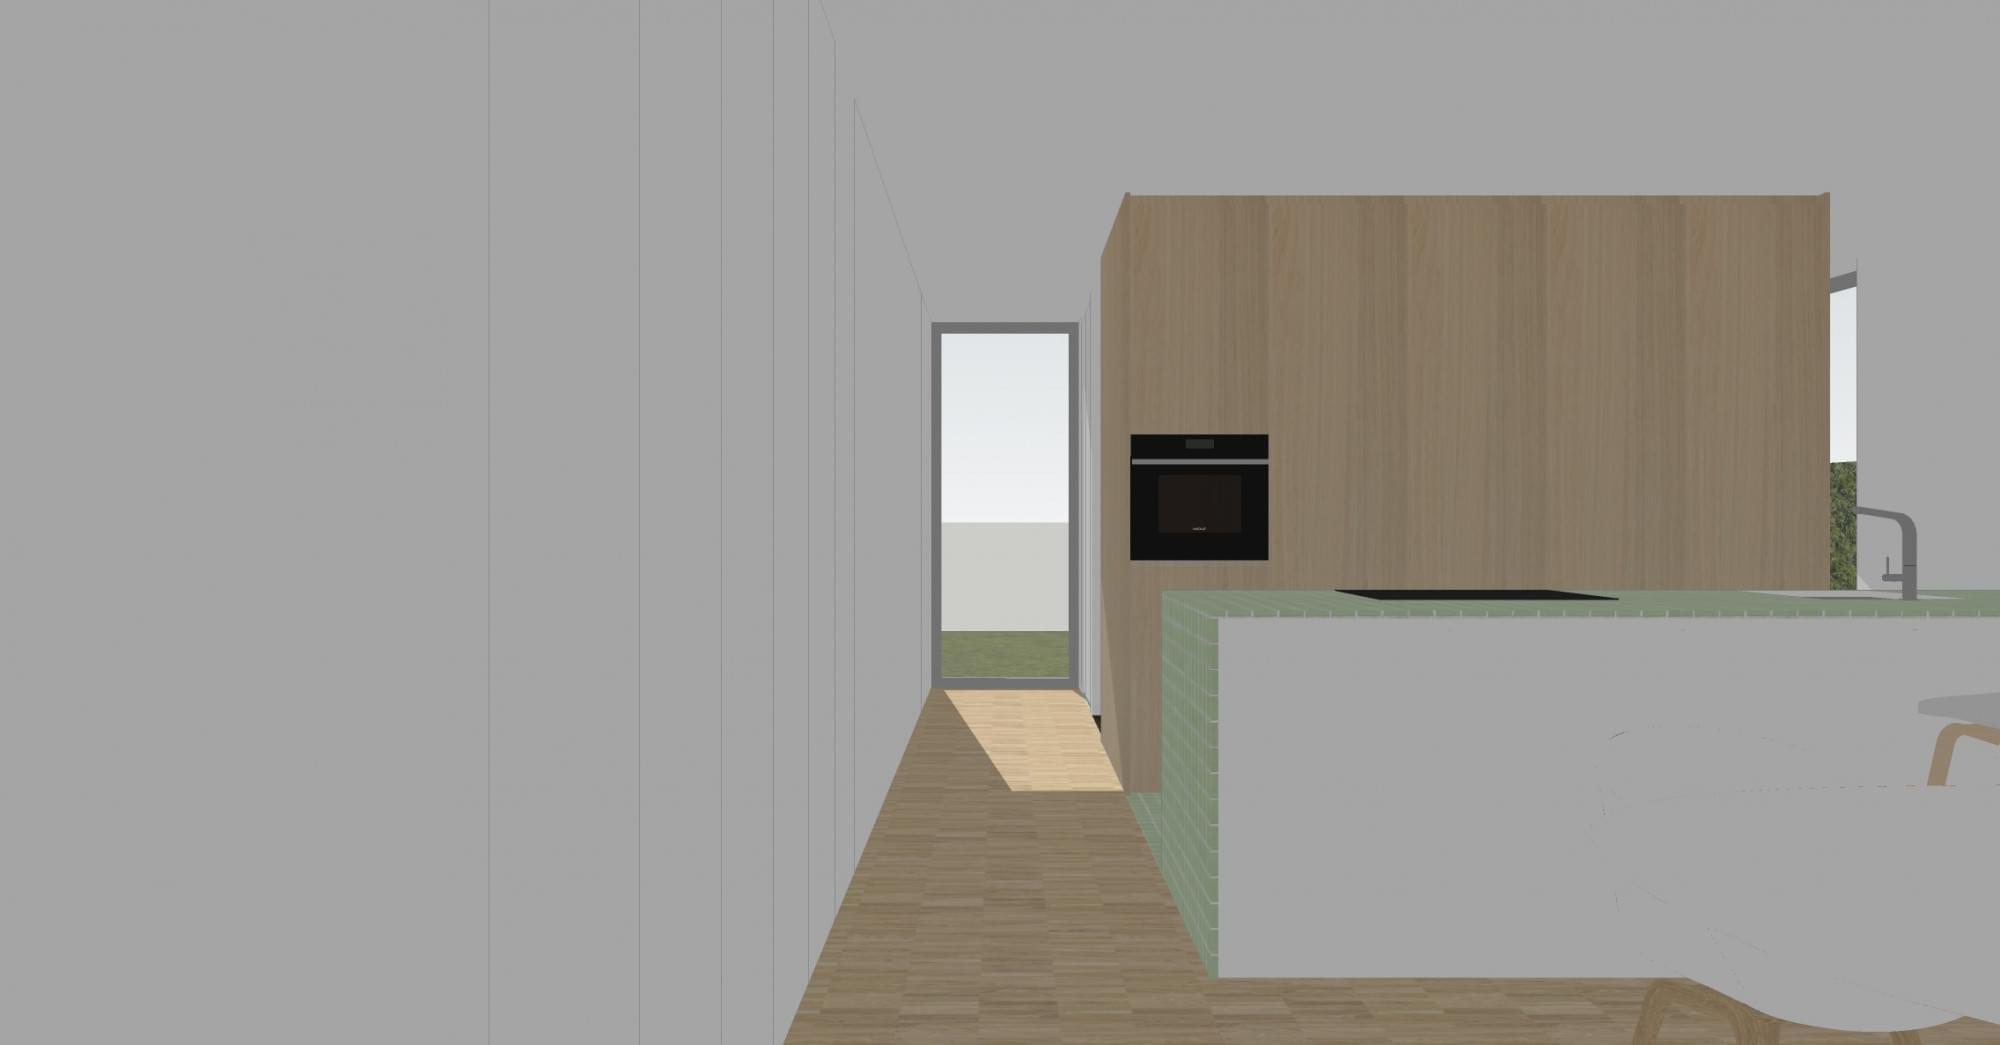 21 03 26 GRYP interieur keuken